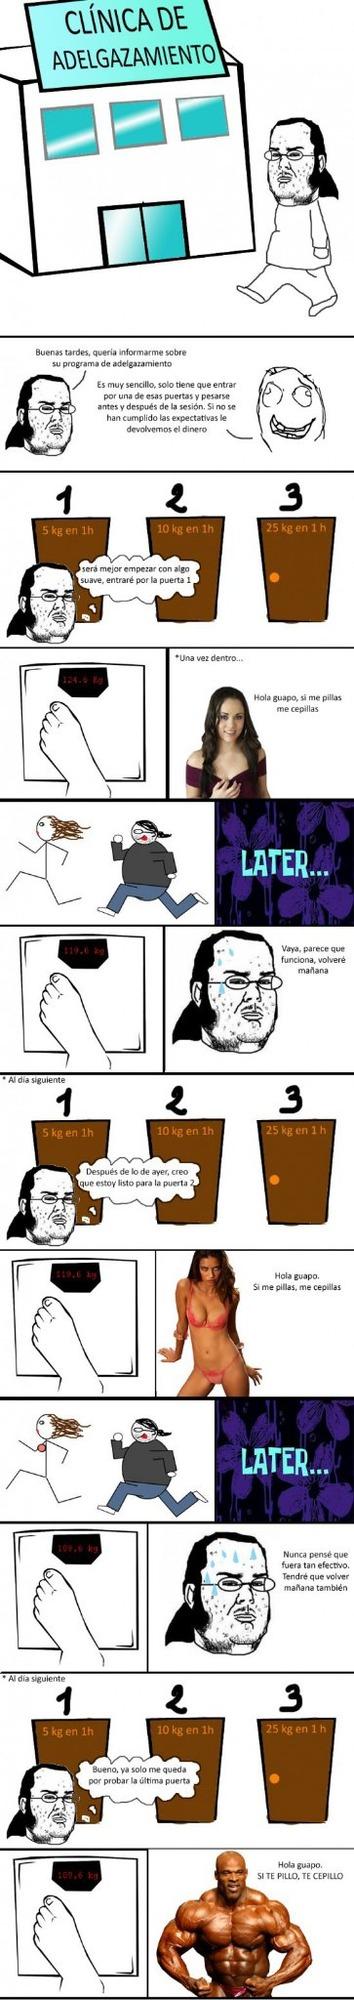 Viejos memes 4.0